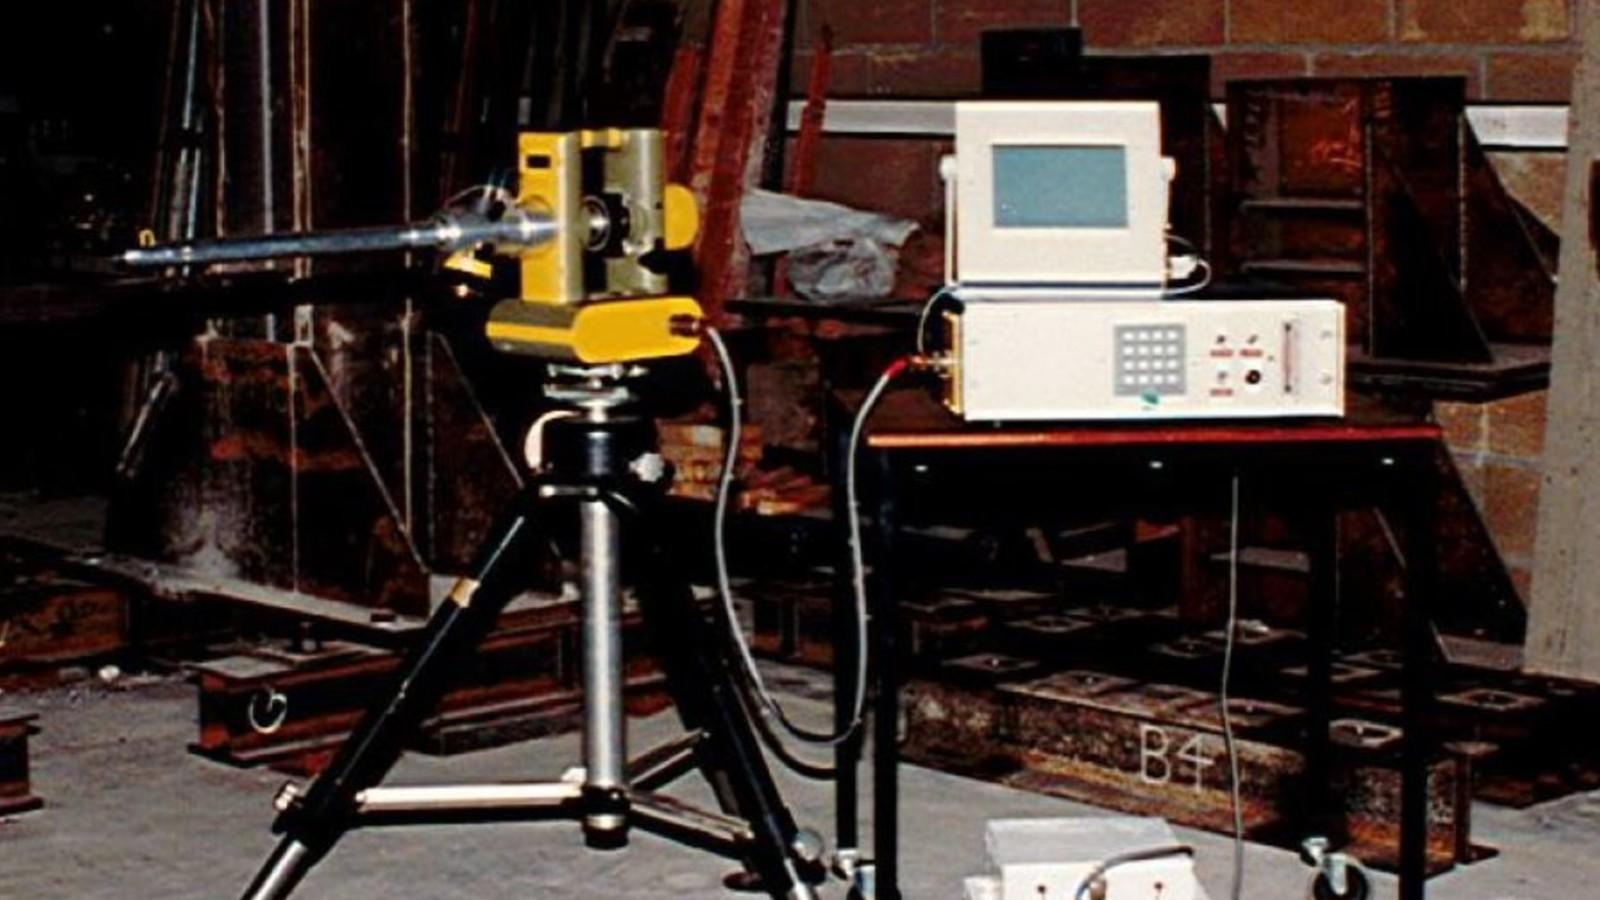 Profiling System c.1990s